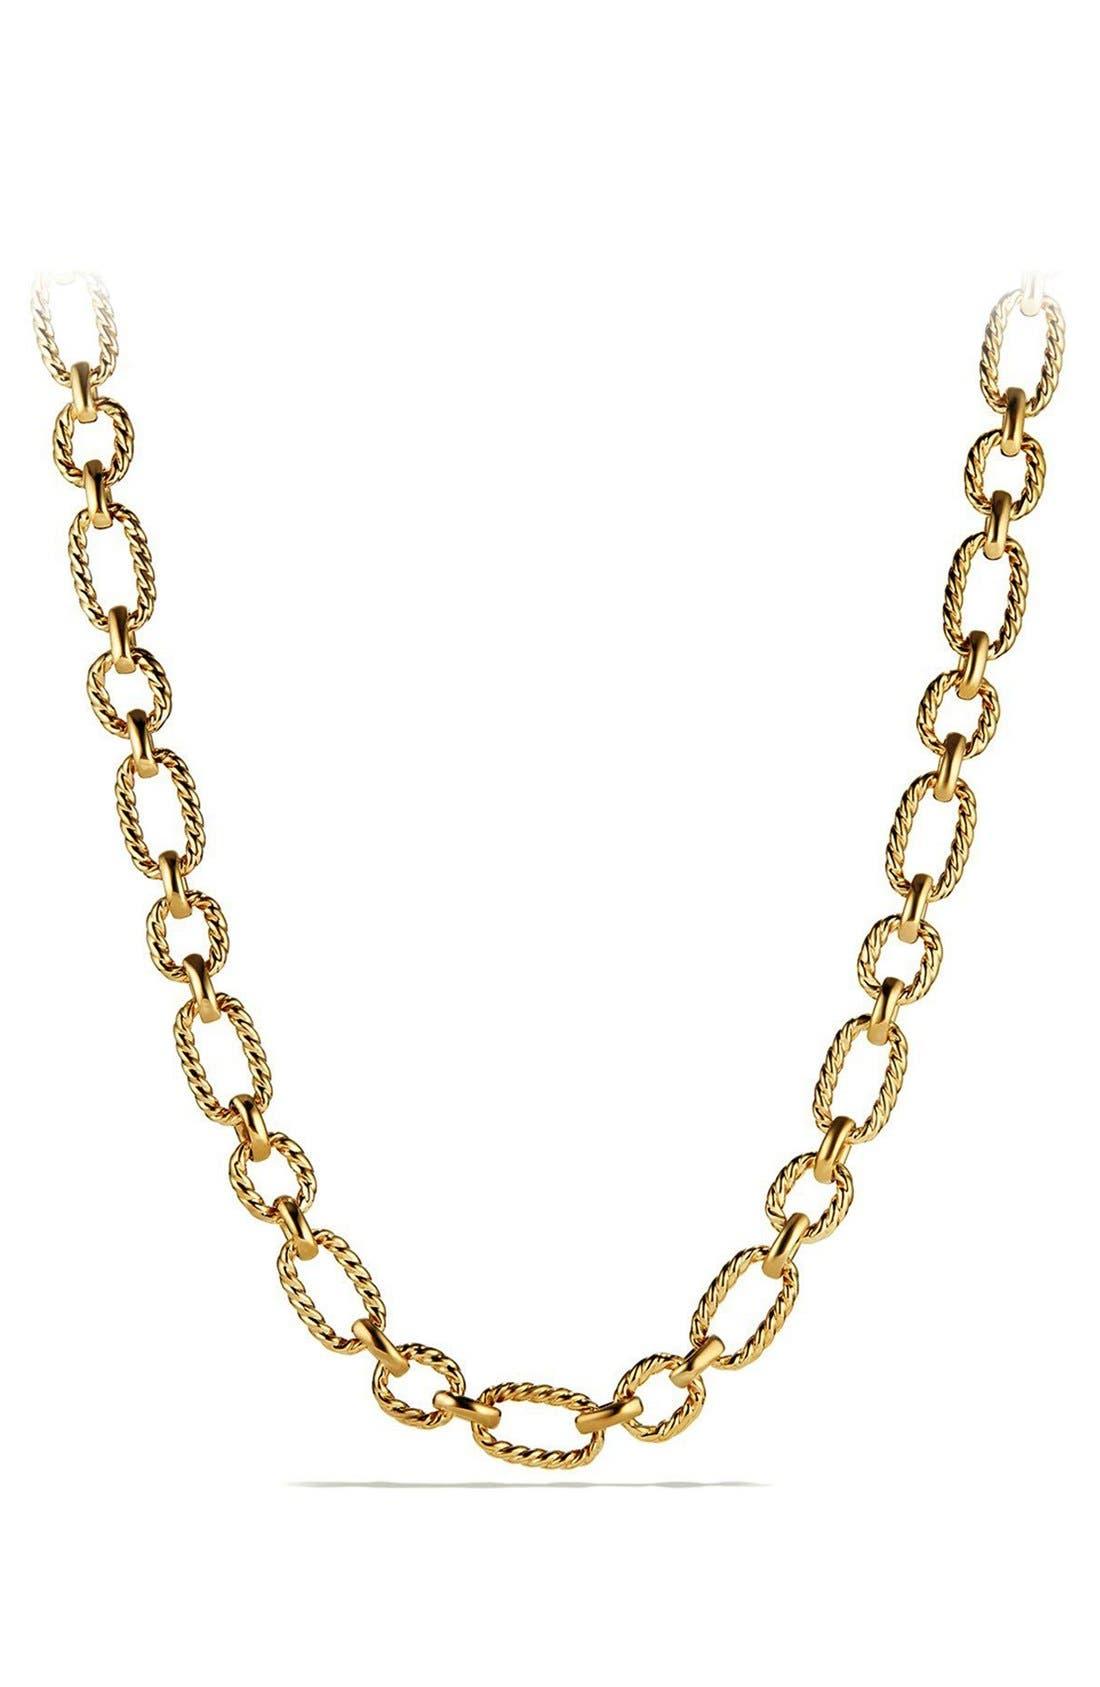 Chain Link Necklace,                             Main thumbnail 1, color,                             710